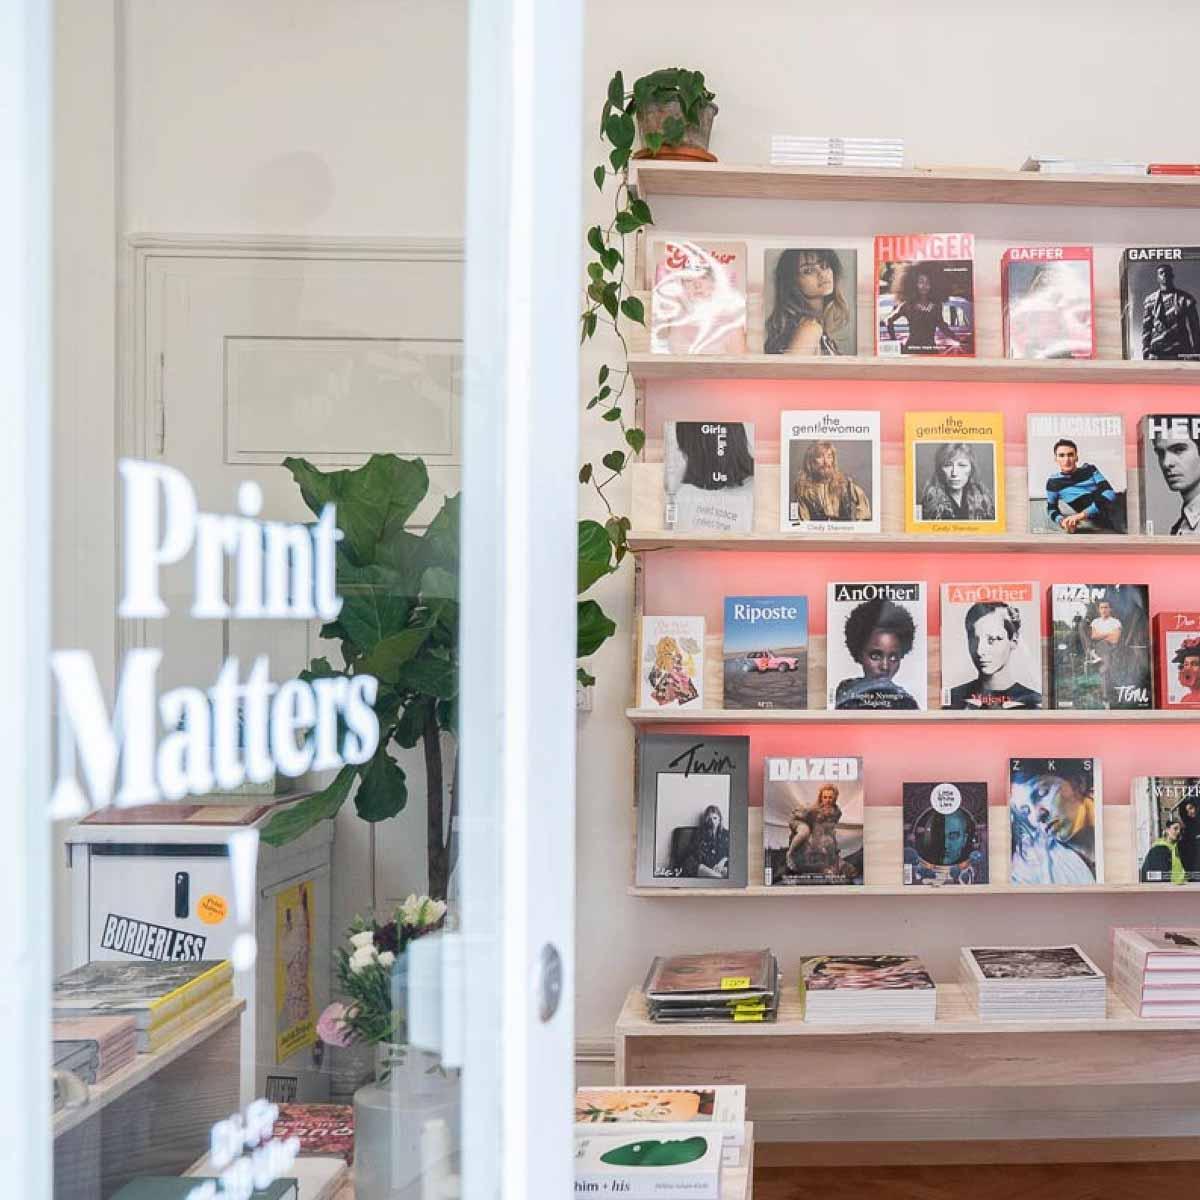 Print Matters! in Zürich-5